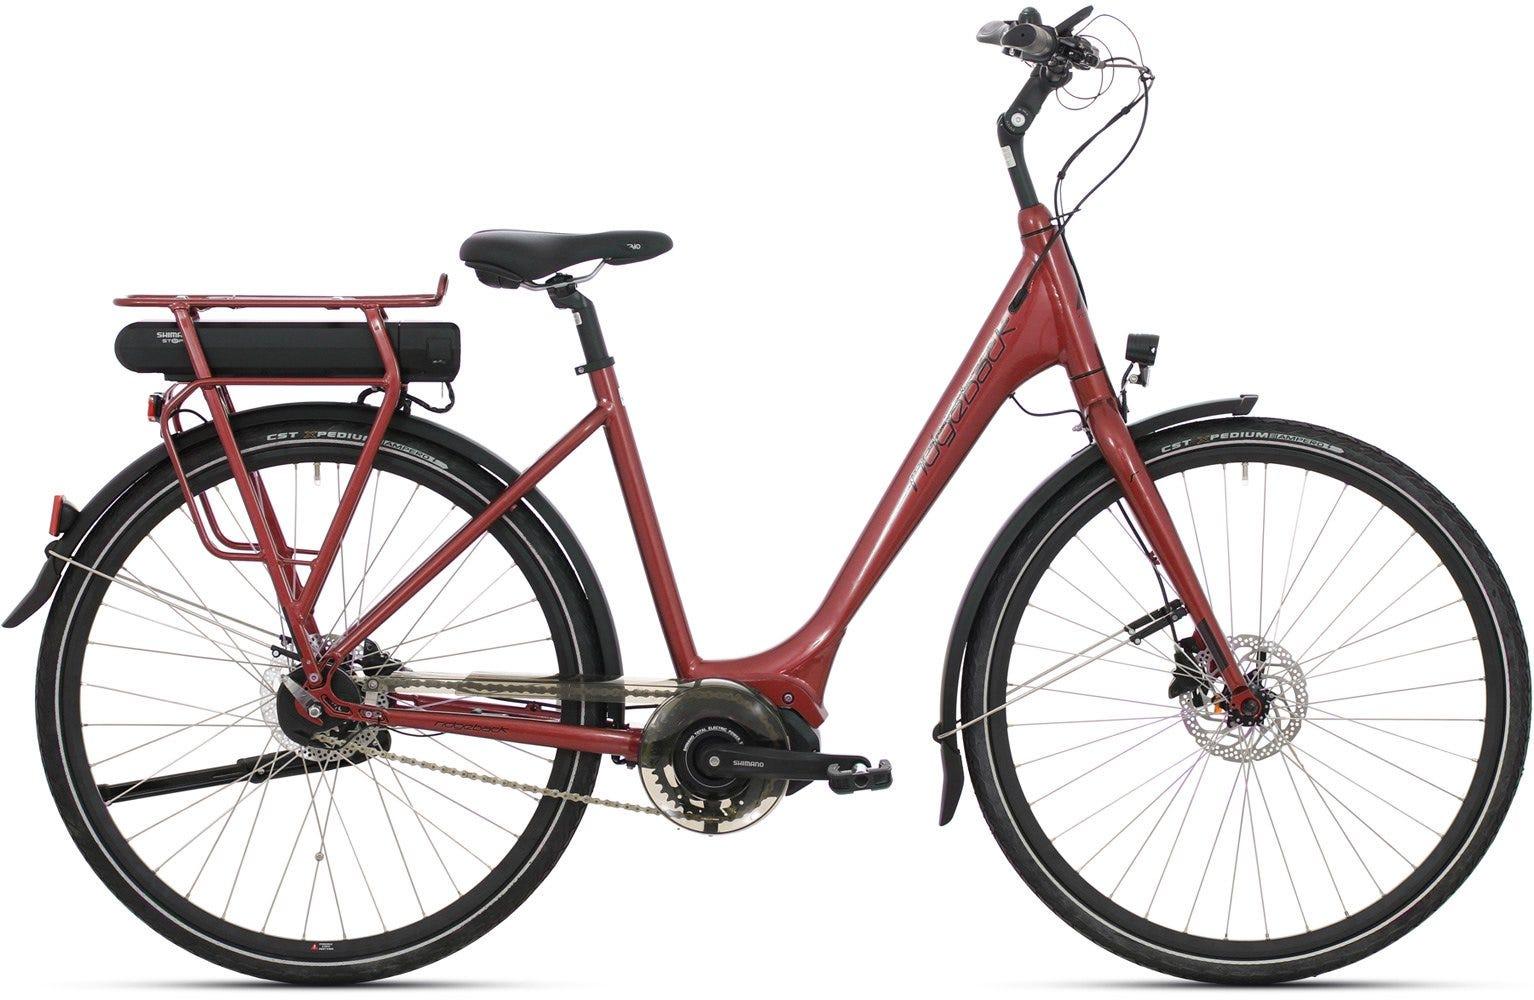 Ridgeback Electron DI2 S/M bike